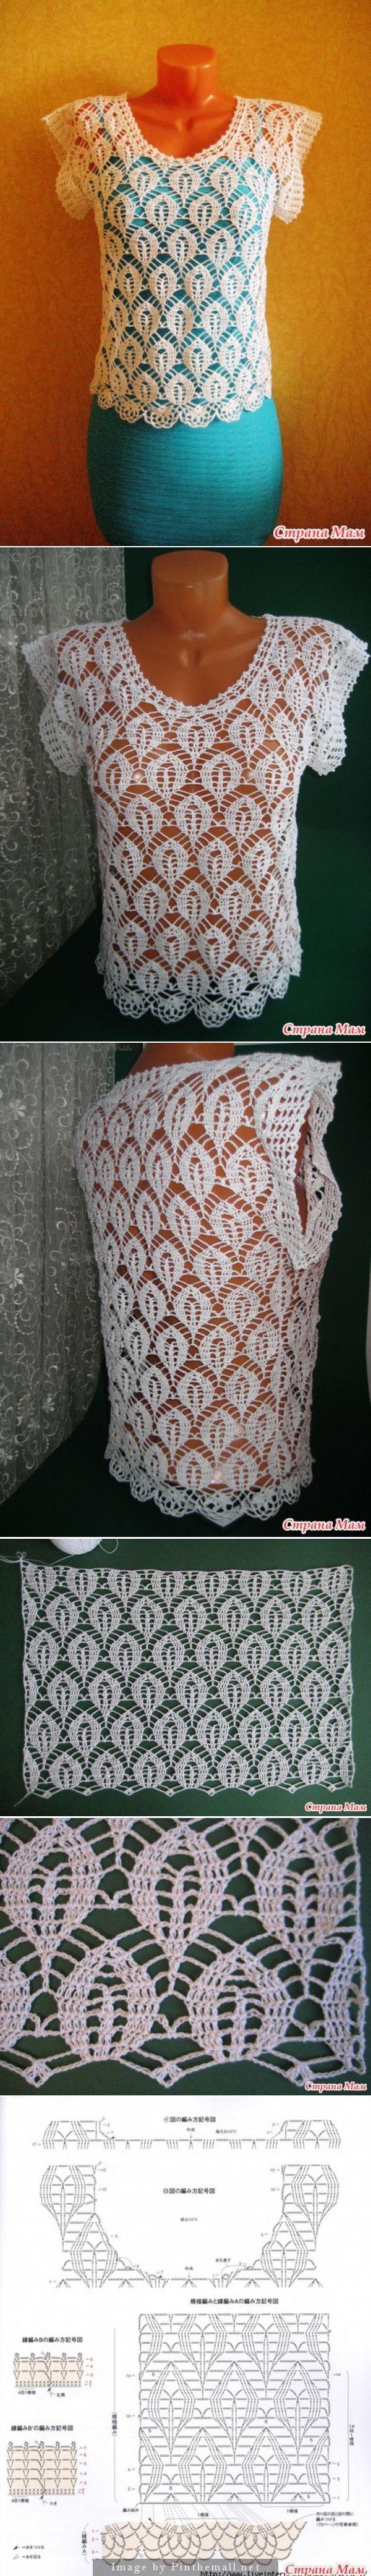 Crochet pullover/top. http://www.stranamam.ru/post/7288777/ - created via http://pinthemall.net